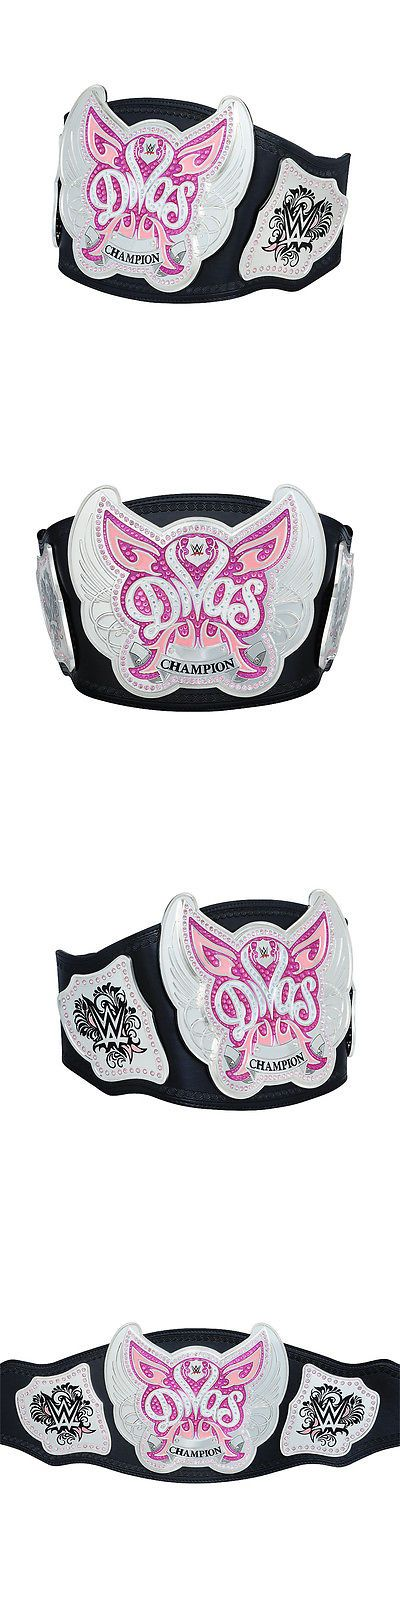 Accessories 36306: Wwe Divas Championship Replica Title Belt (2014) -> BUY IT NOW ONLY: $341.99 on eBay!